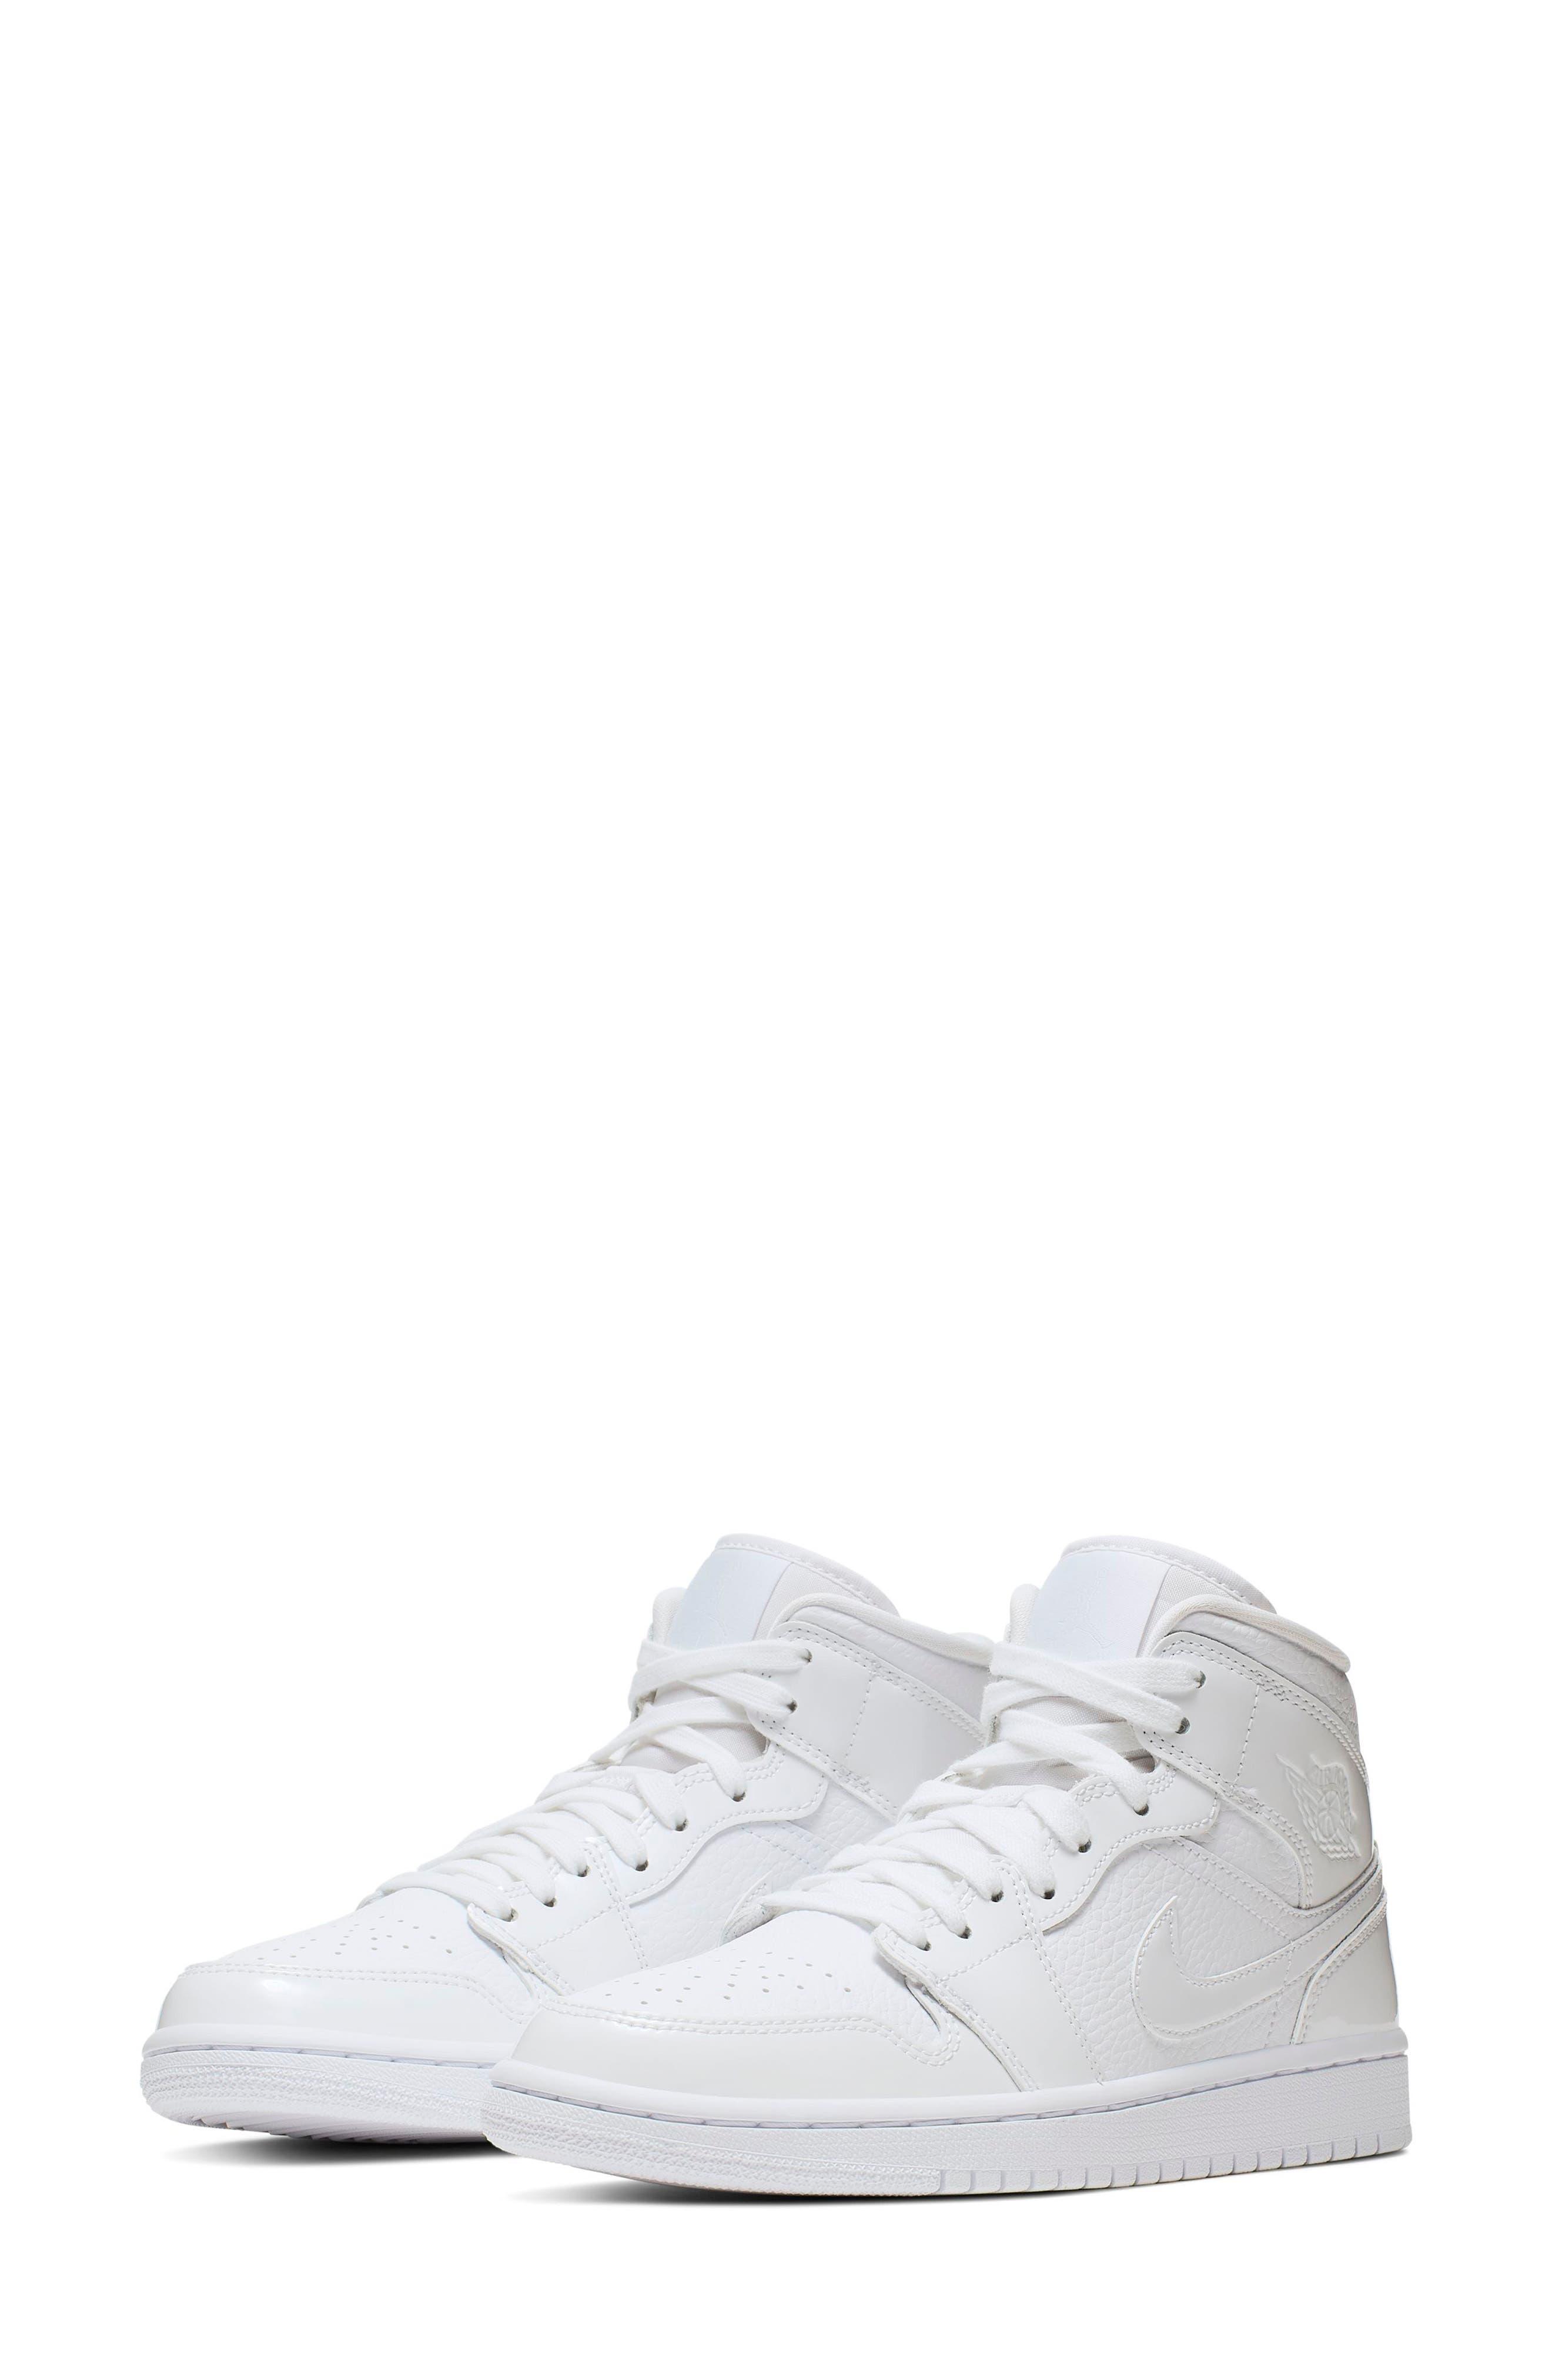 air jordan 1s all white